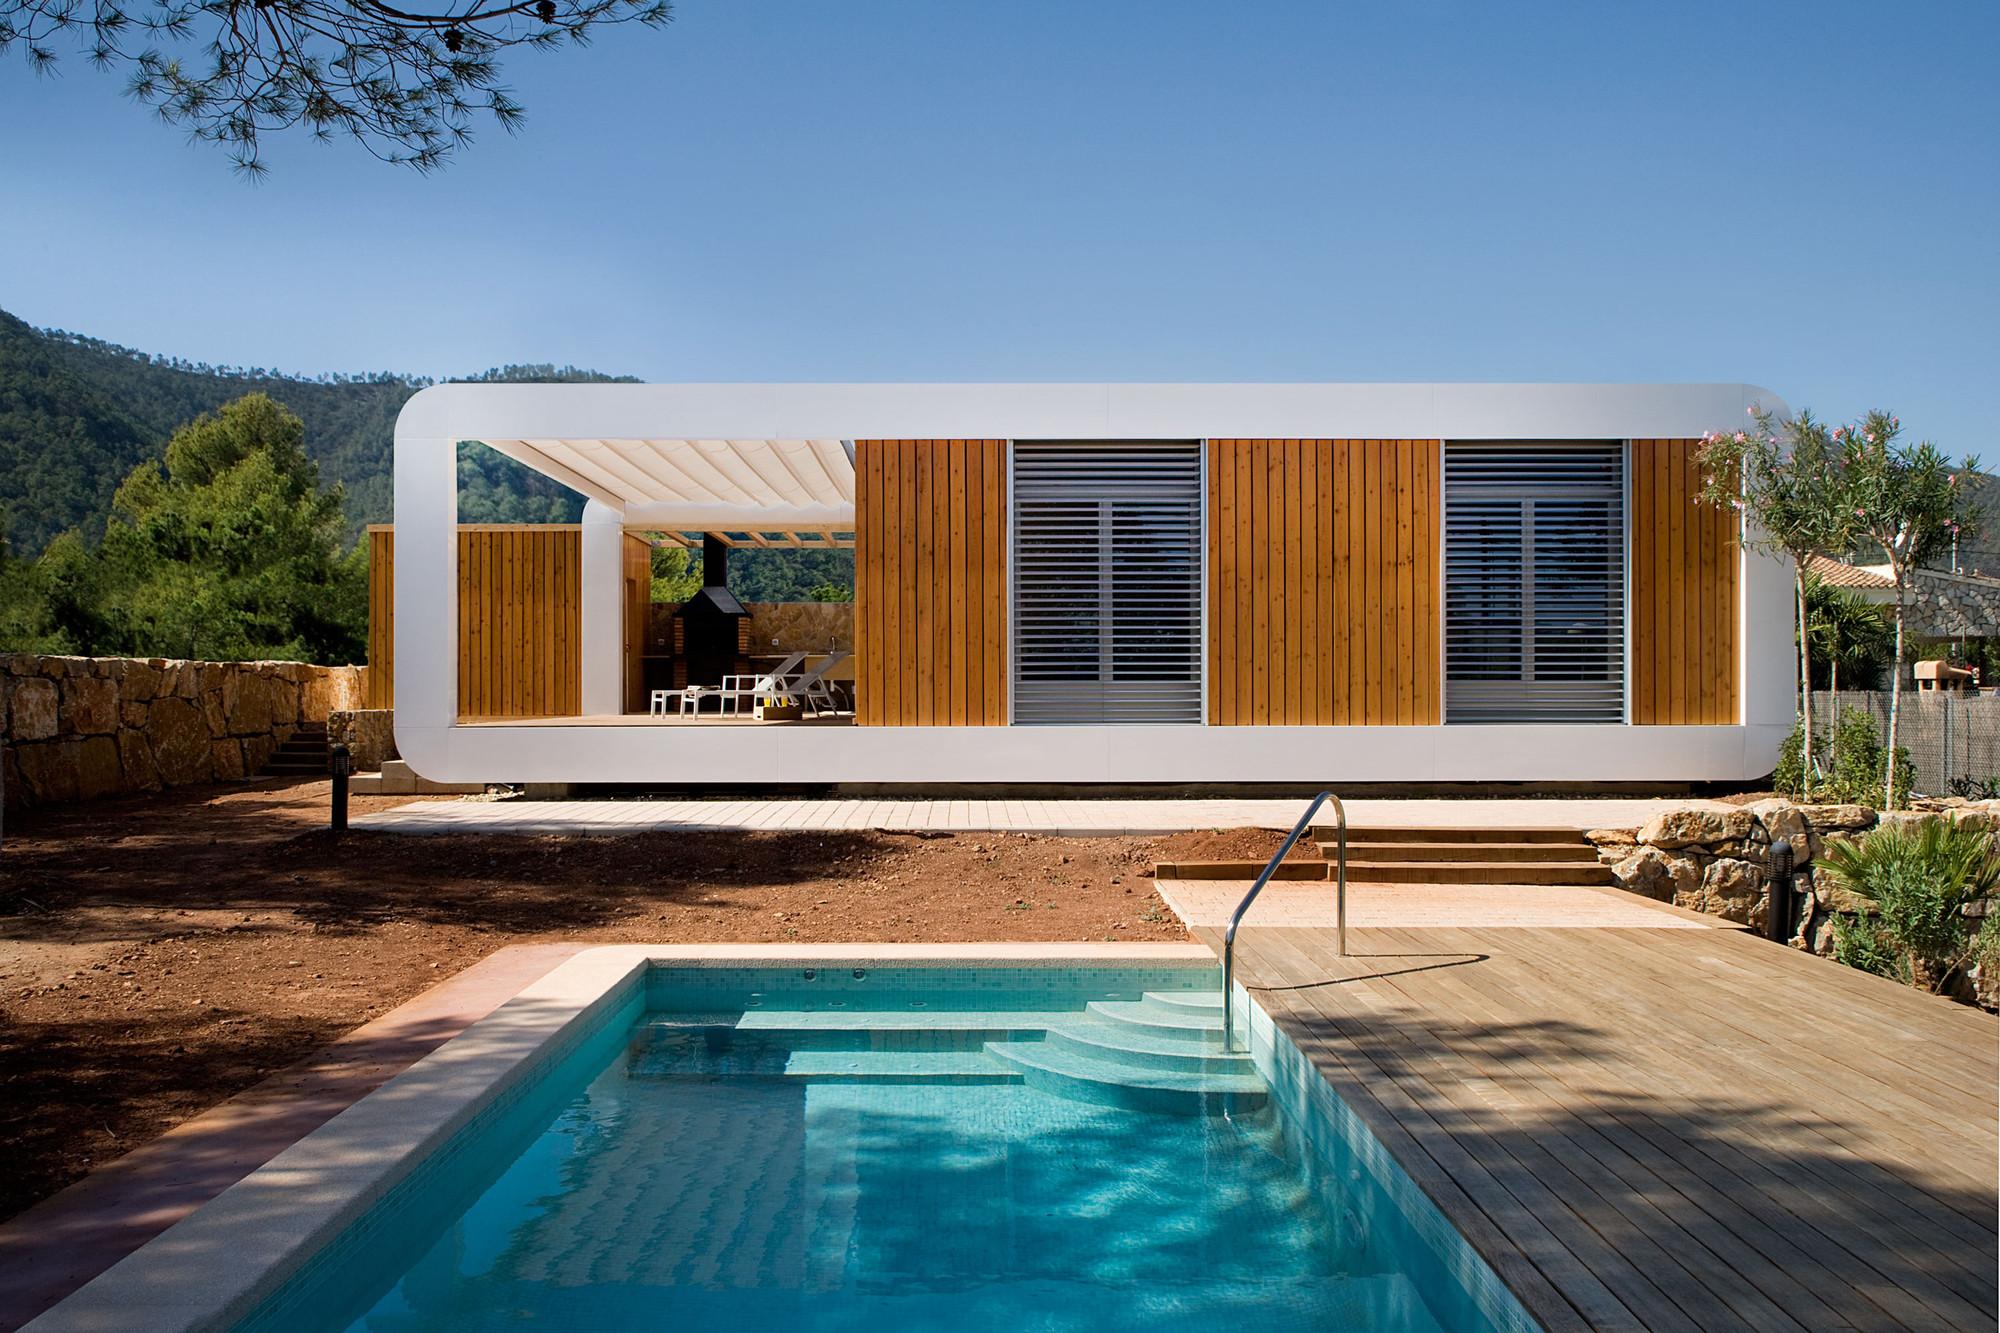 La casa ecológica 3.0 / NOEM, © Meritxell Arjalaguer